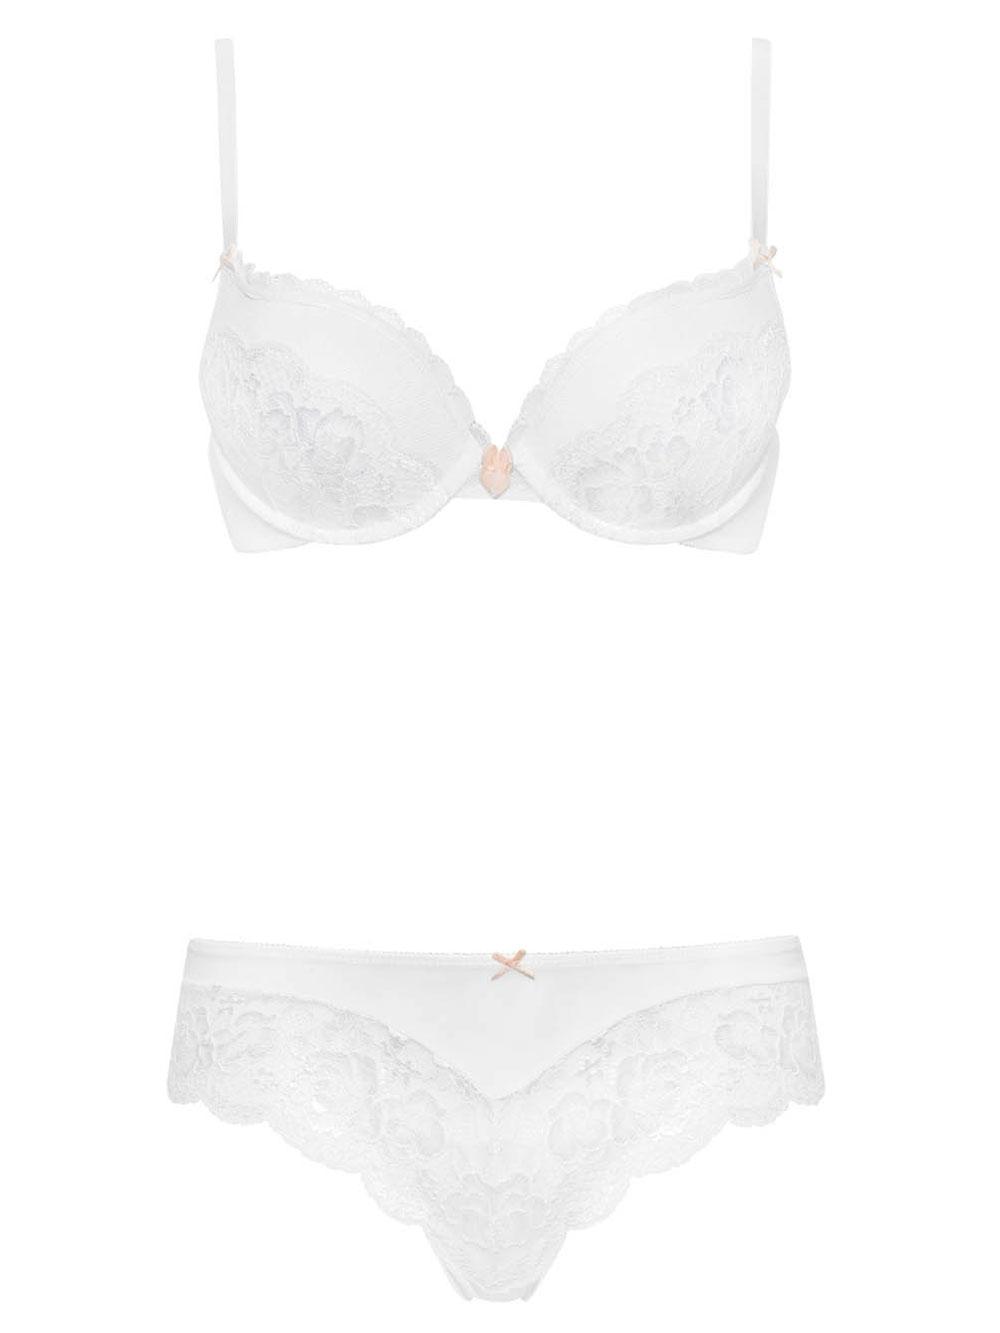 a814f82611 Ann Summers Womens Sexy Lace White Plunge Bra Hot Seductive Lingerie  Underwear